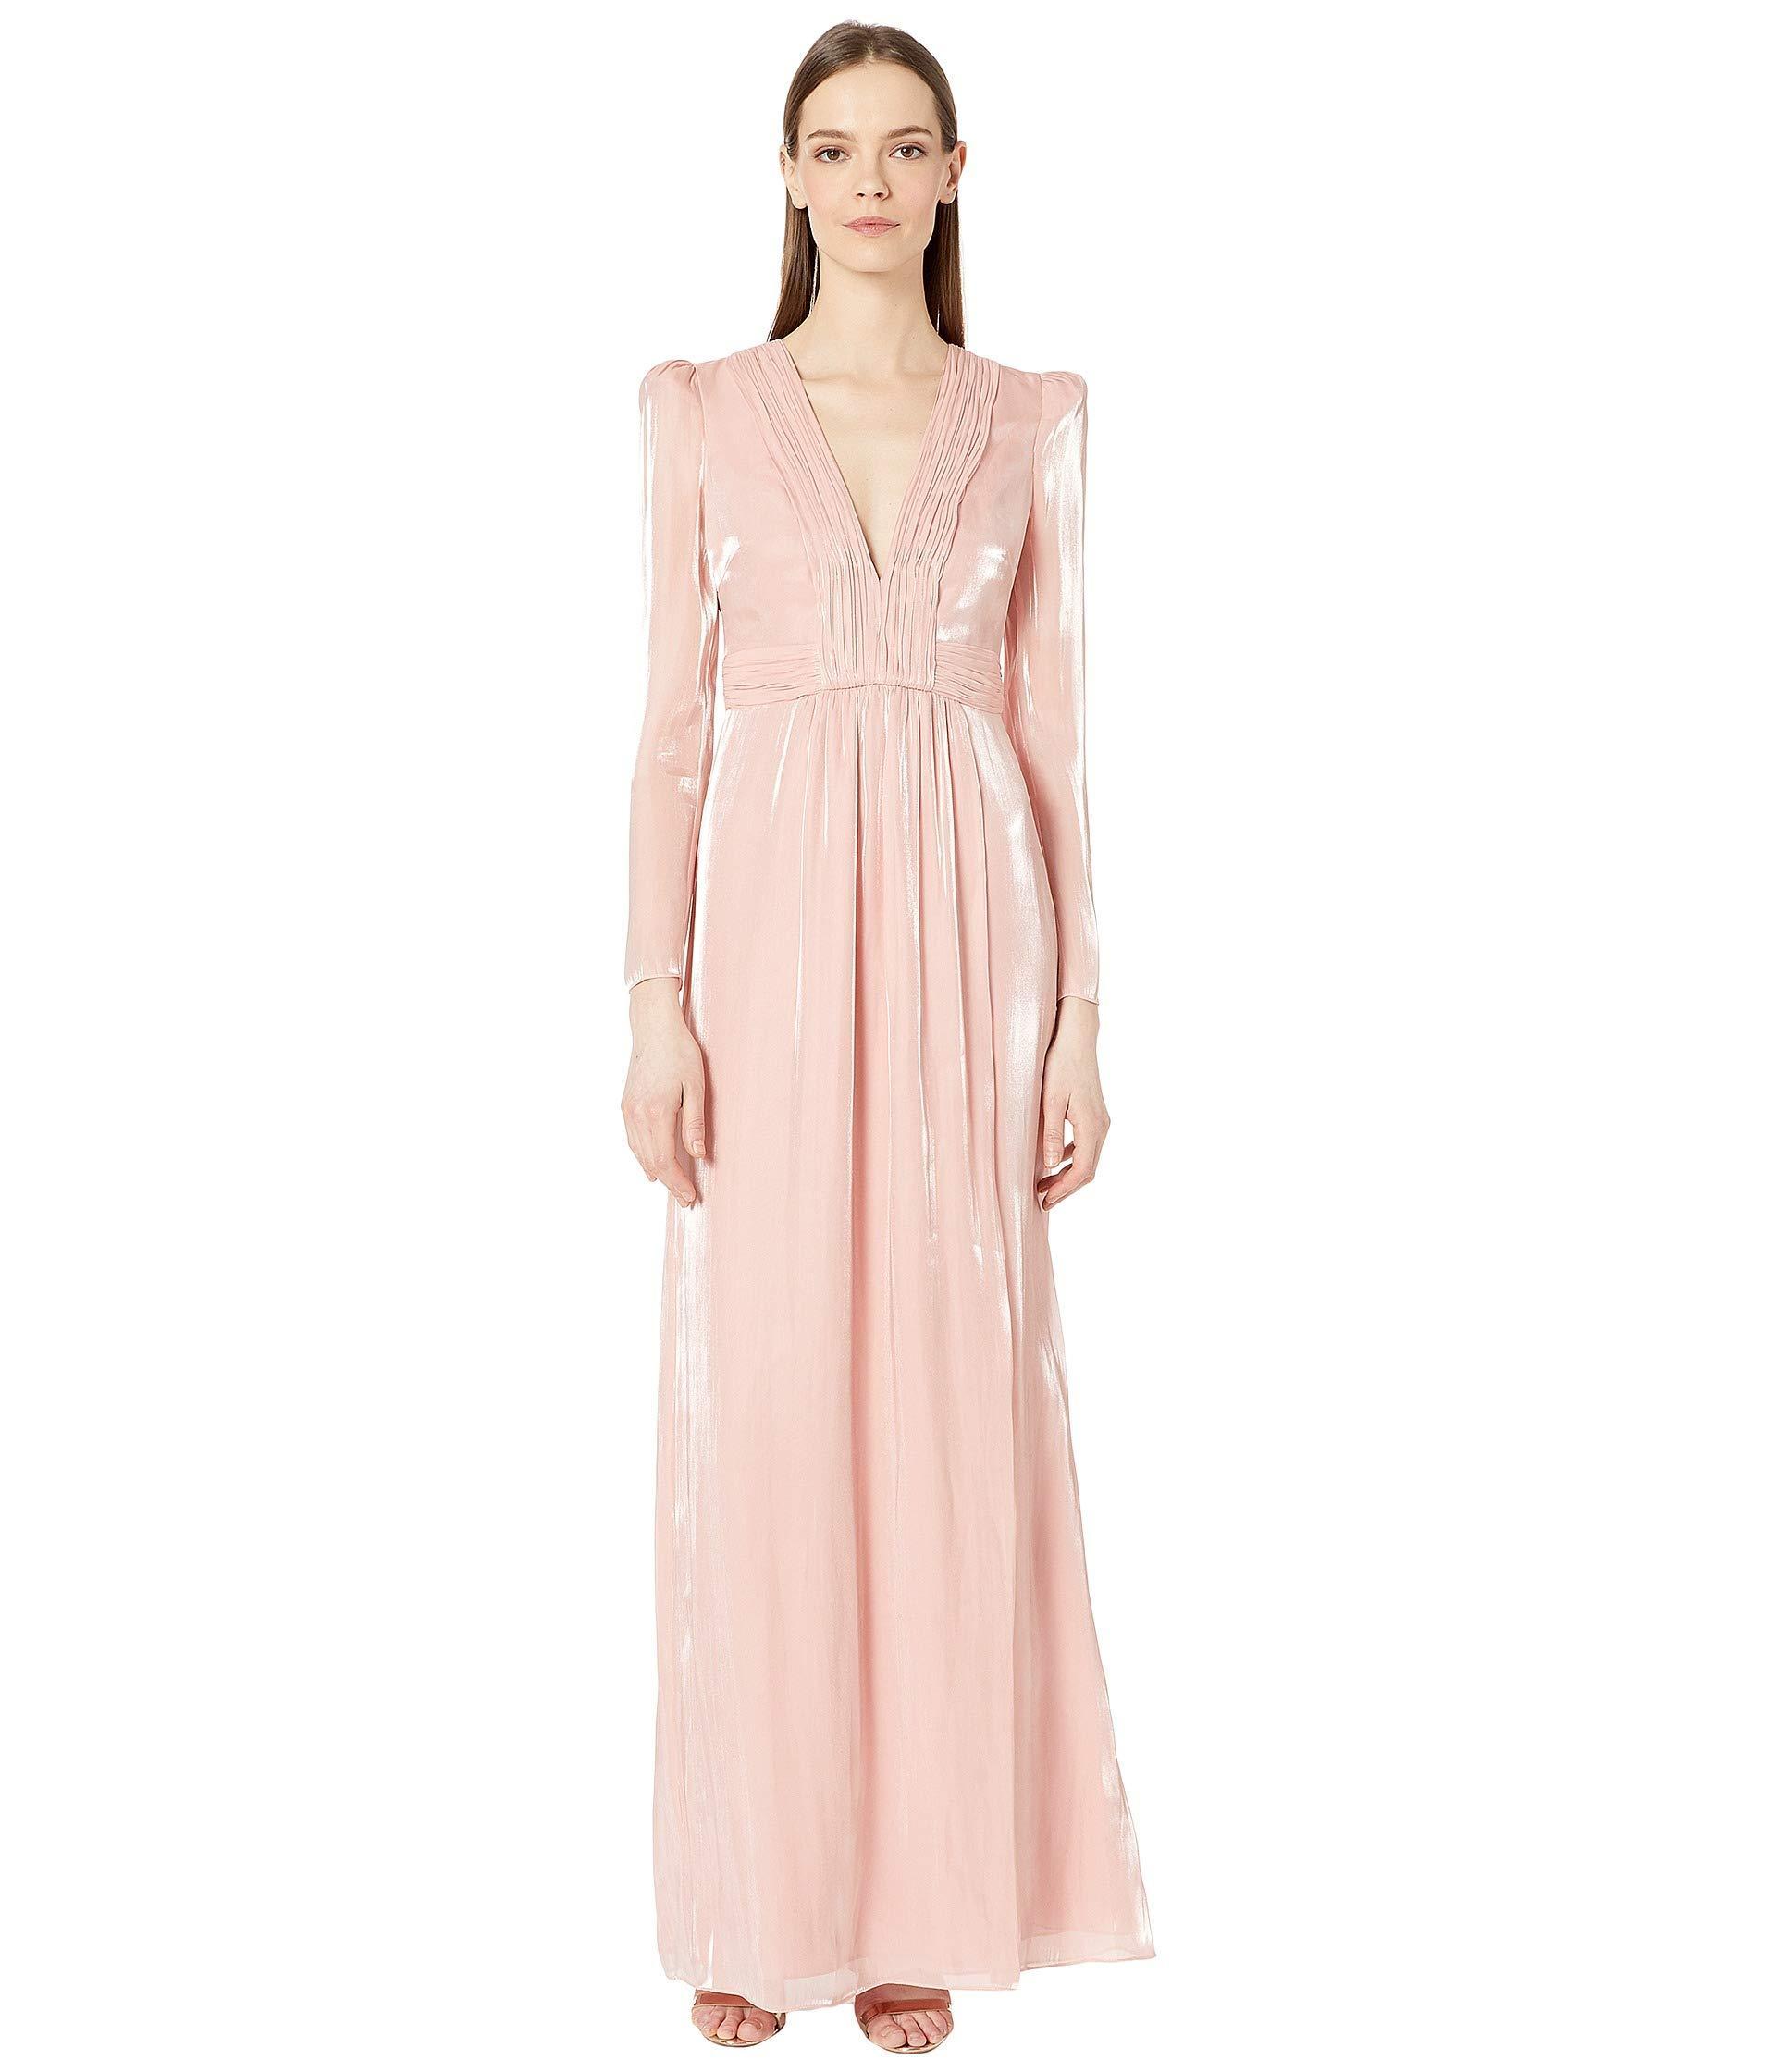 fca6901cbee Lyst - Rachel Zoe Rosalie Gown (tulip) Women s Dress in Pink